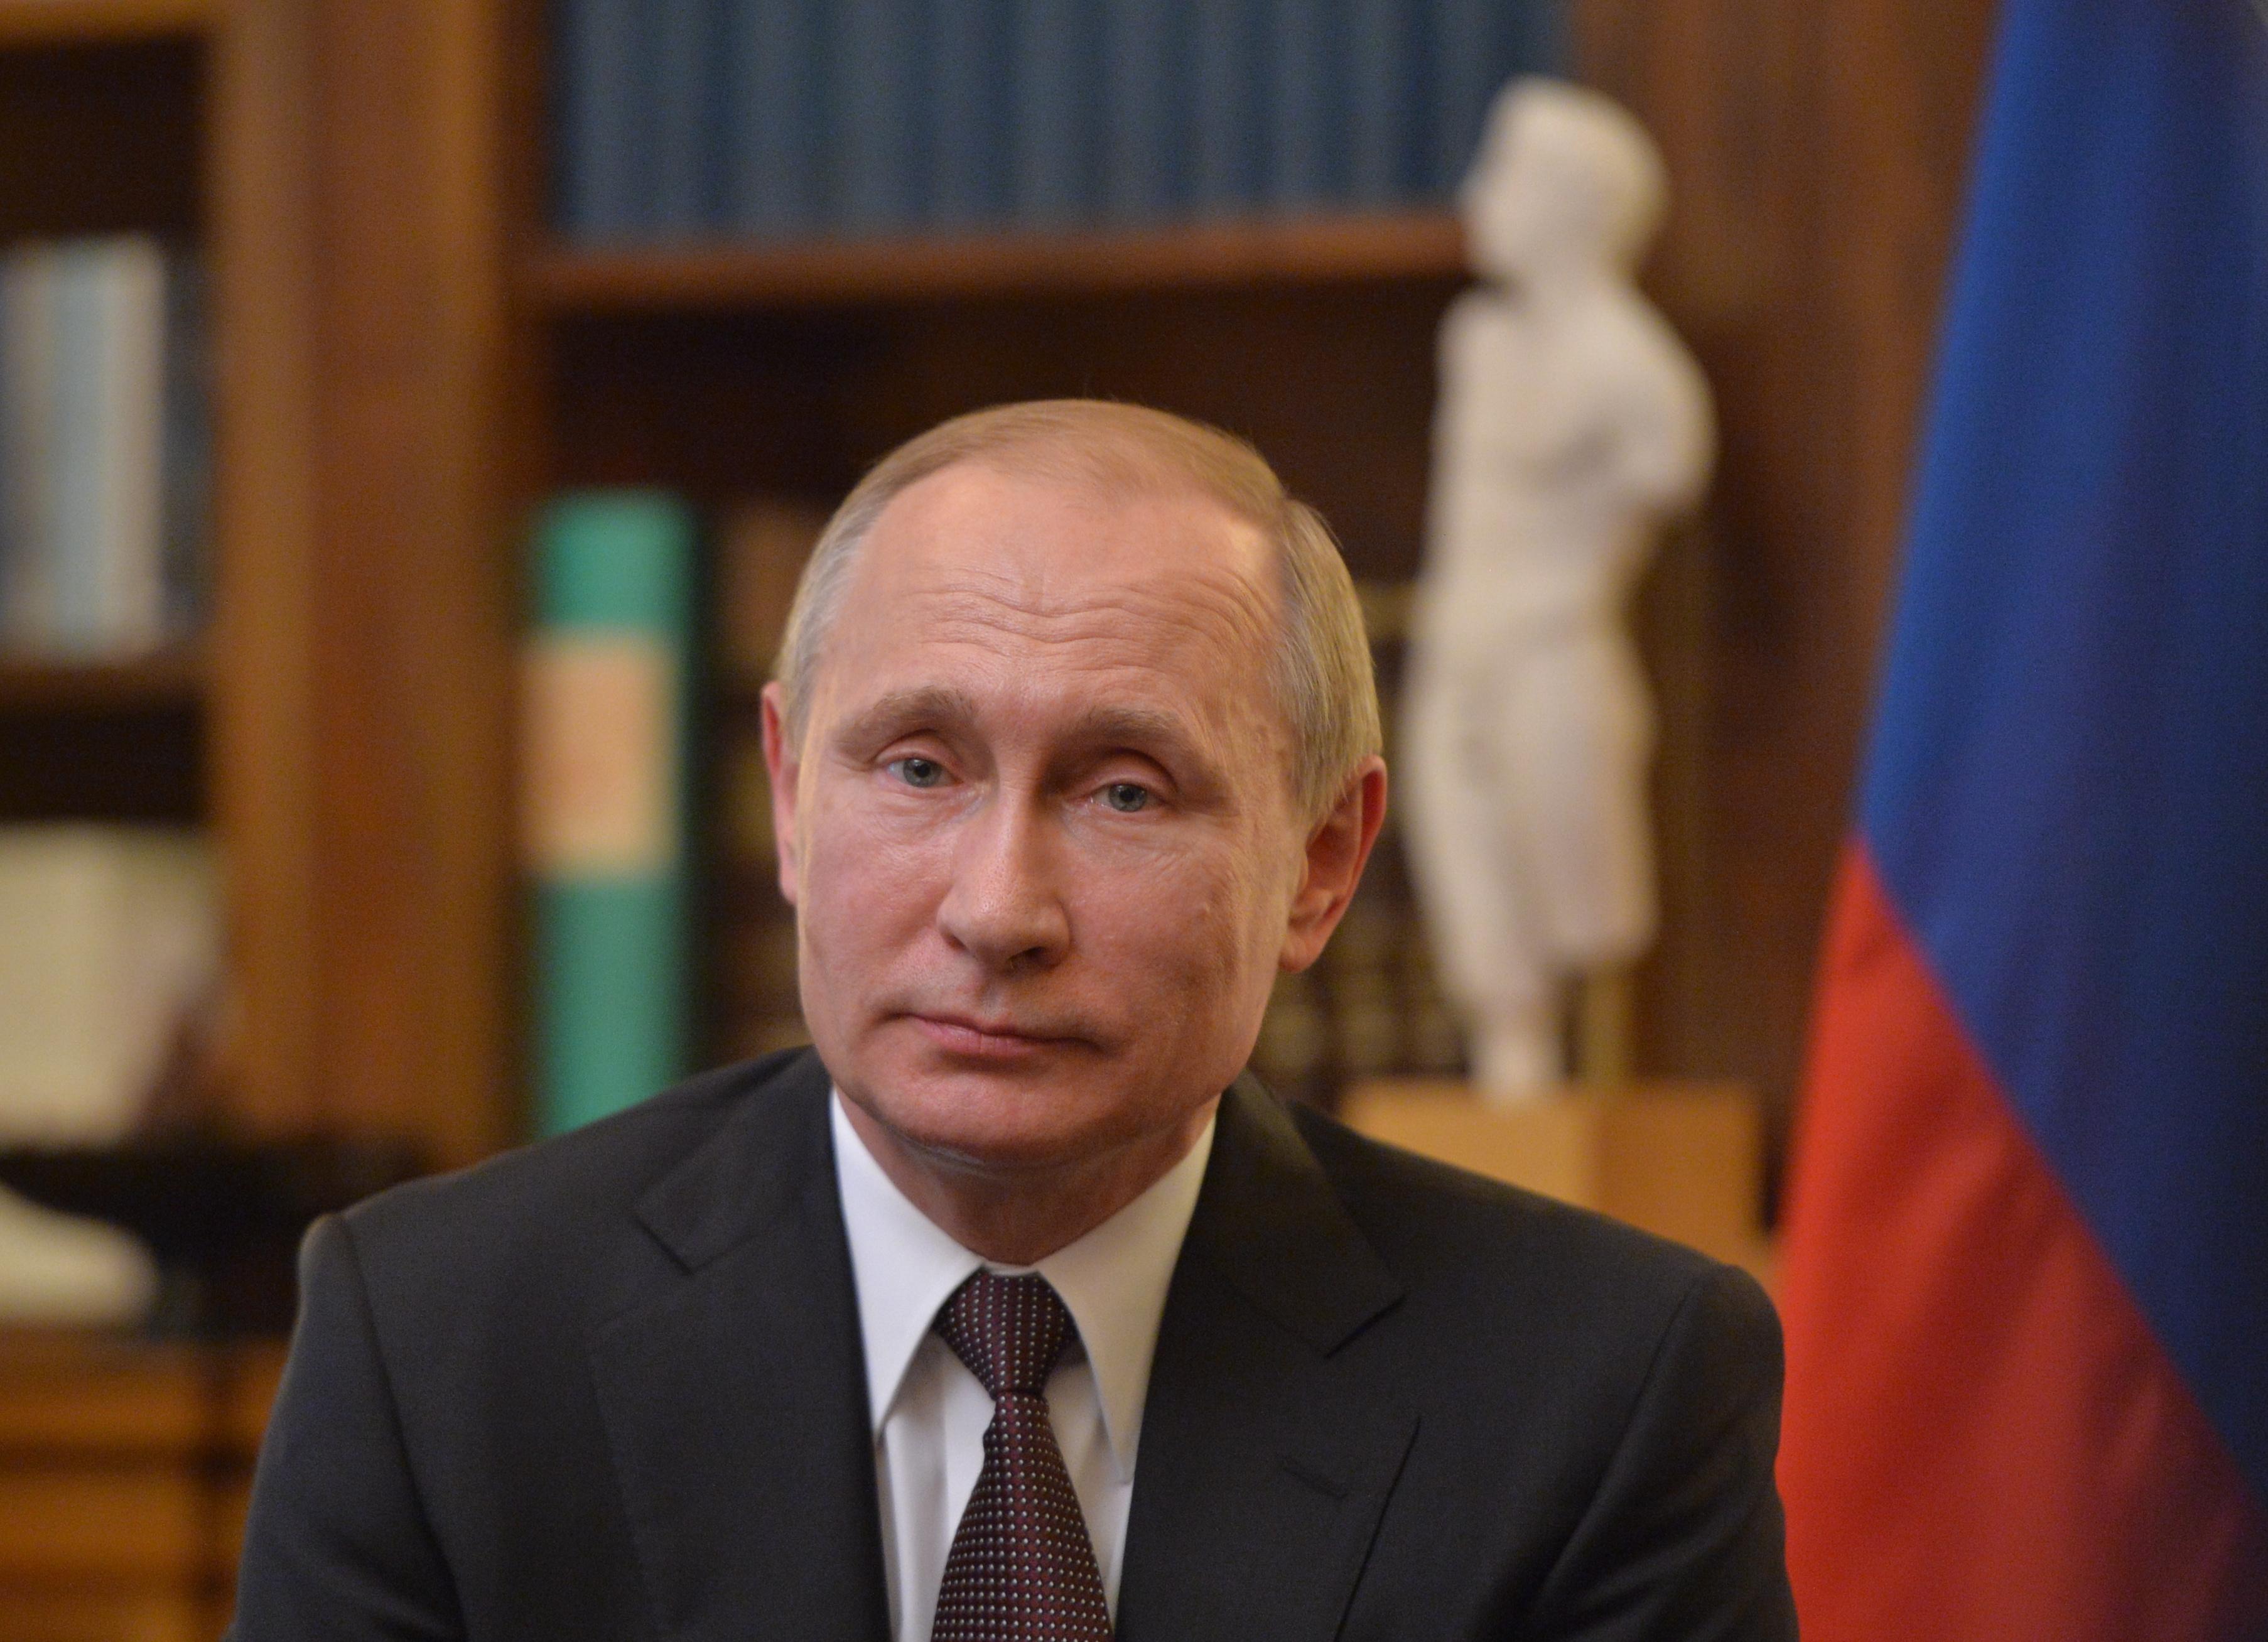 Romania and Poland in Russia's cross-hairs, warns Putin